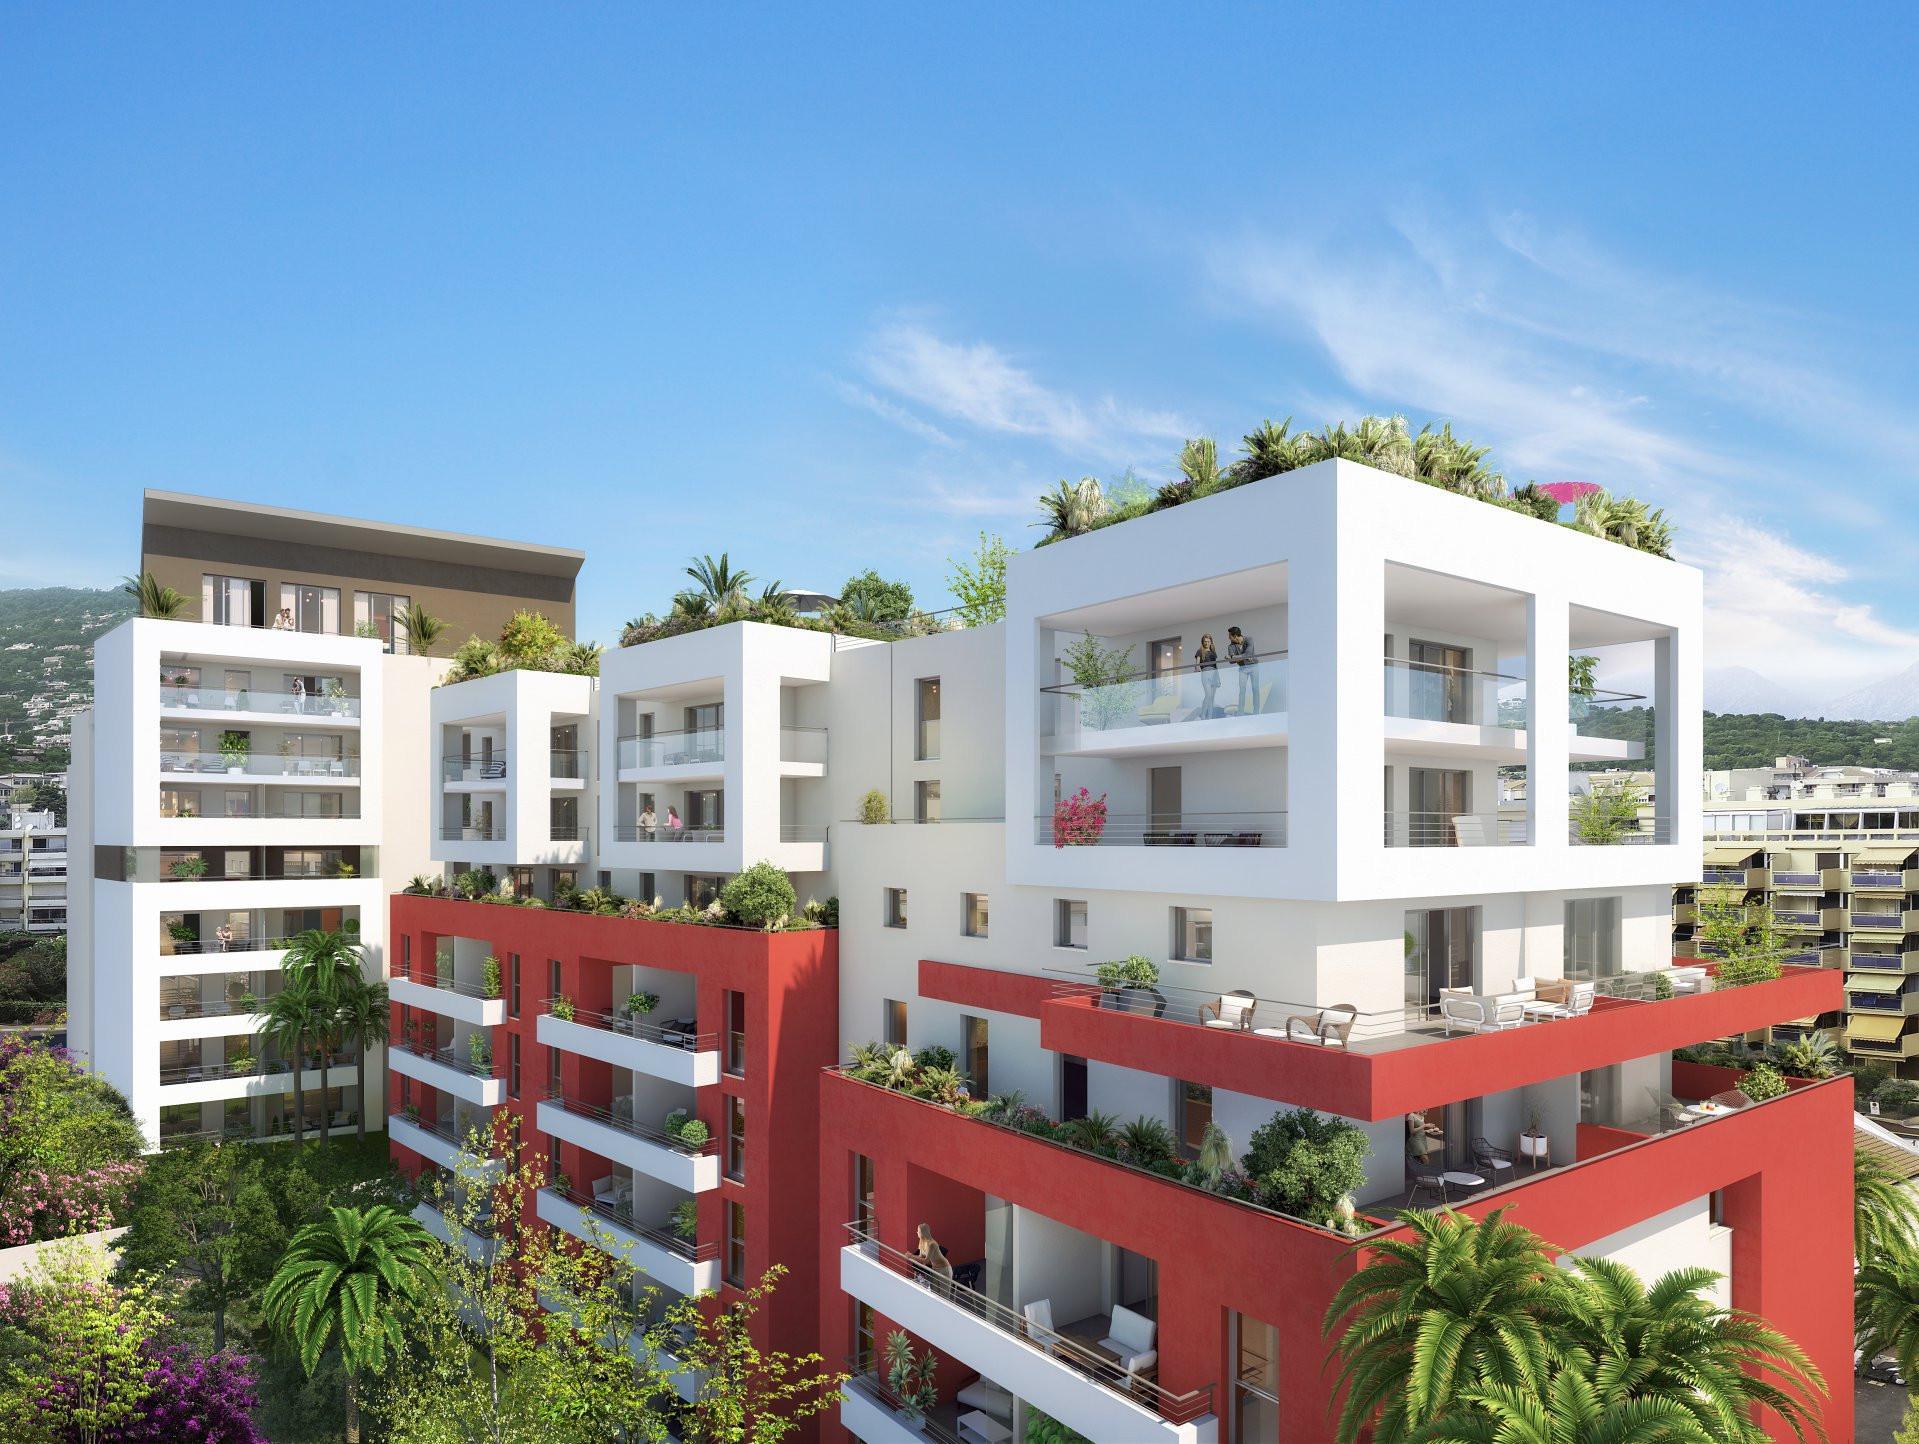 ROQUEBRUNE CAP MARTIN - vente appartement de prestige - proche plage